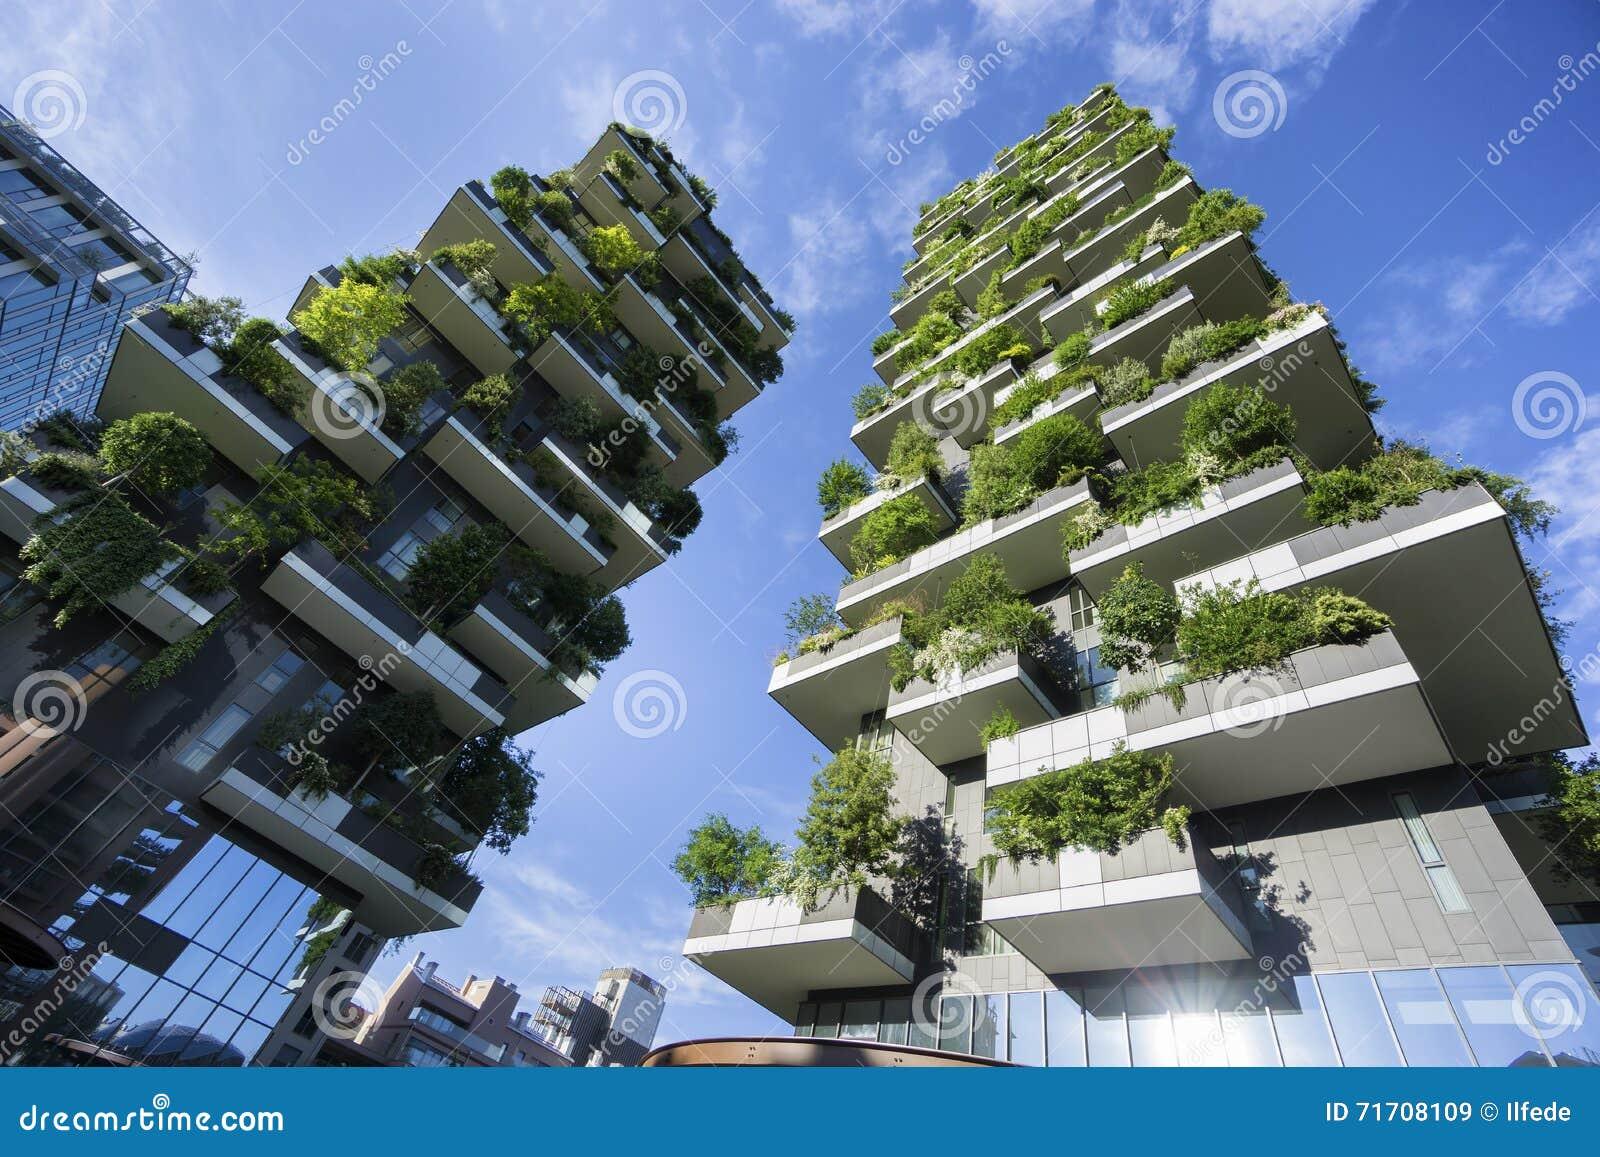 Bosco Verticale Vertical Forest i Milan